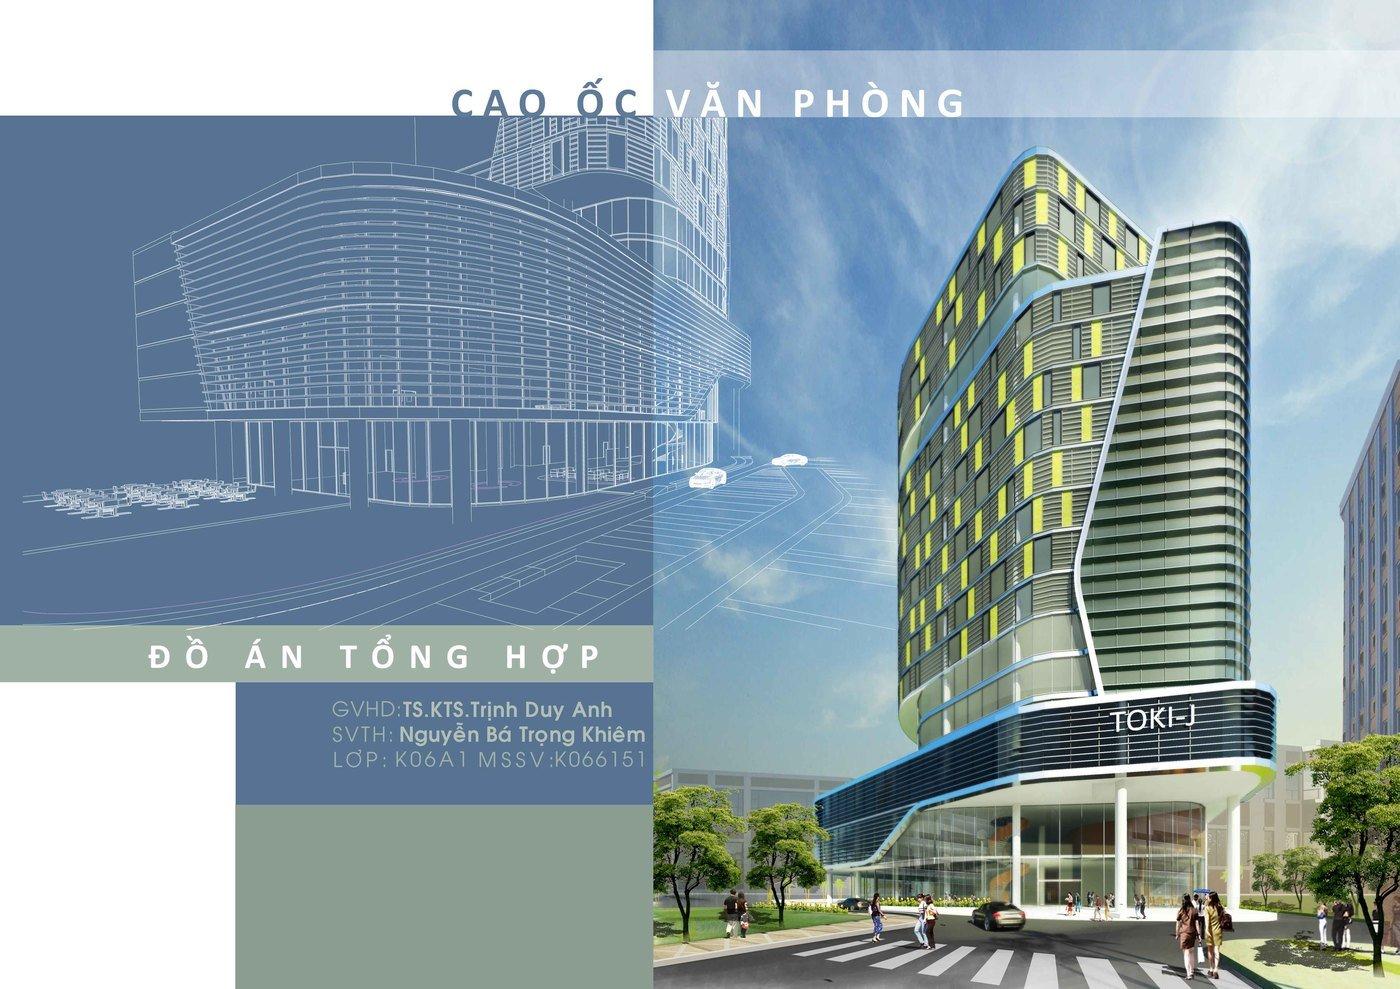 Office building design by khiem nguyen at for Architecture building plan design